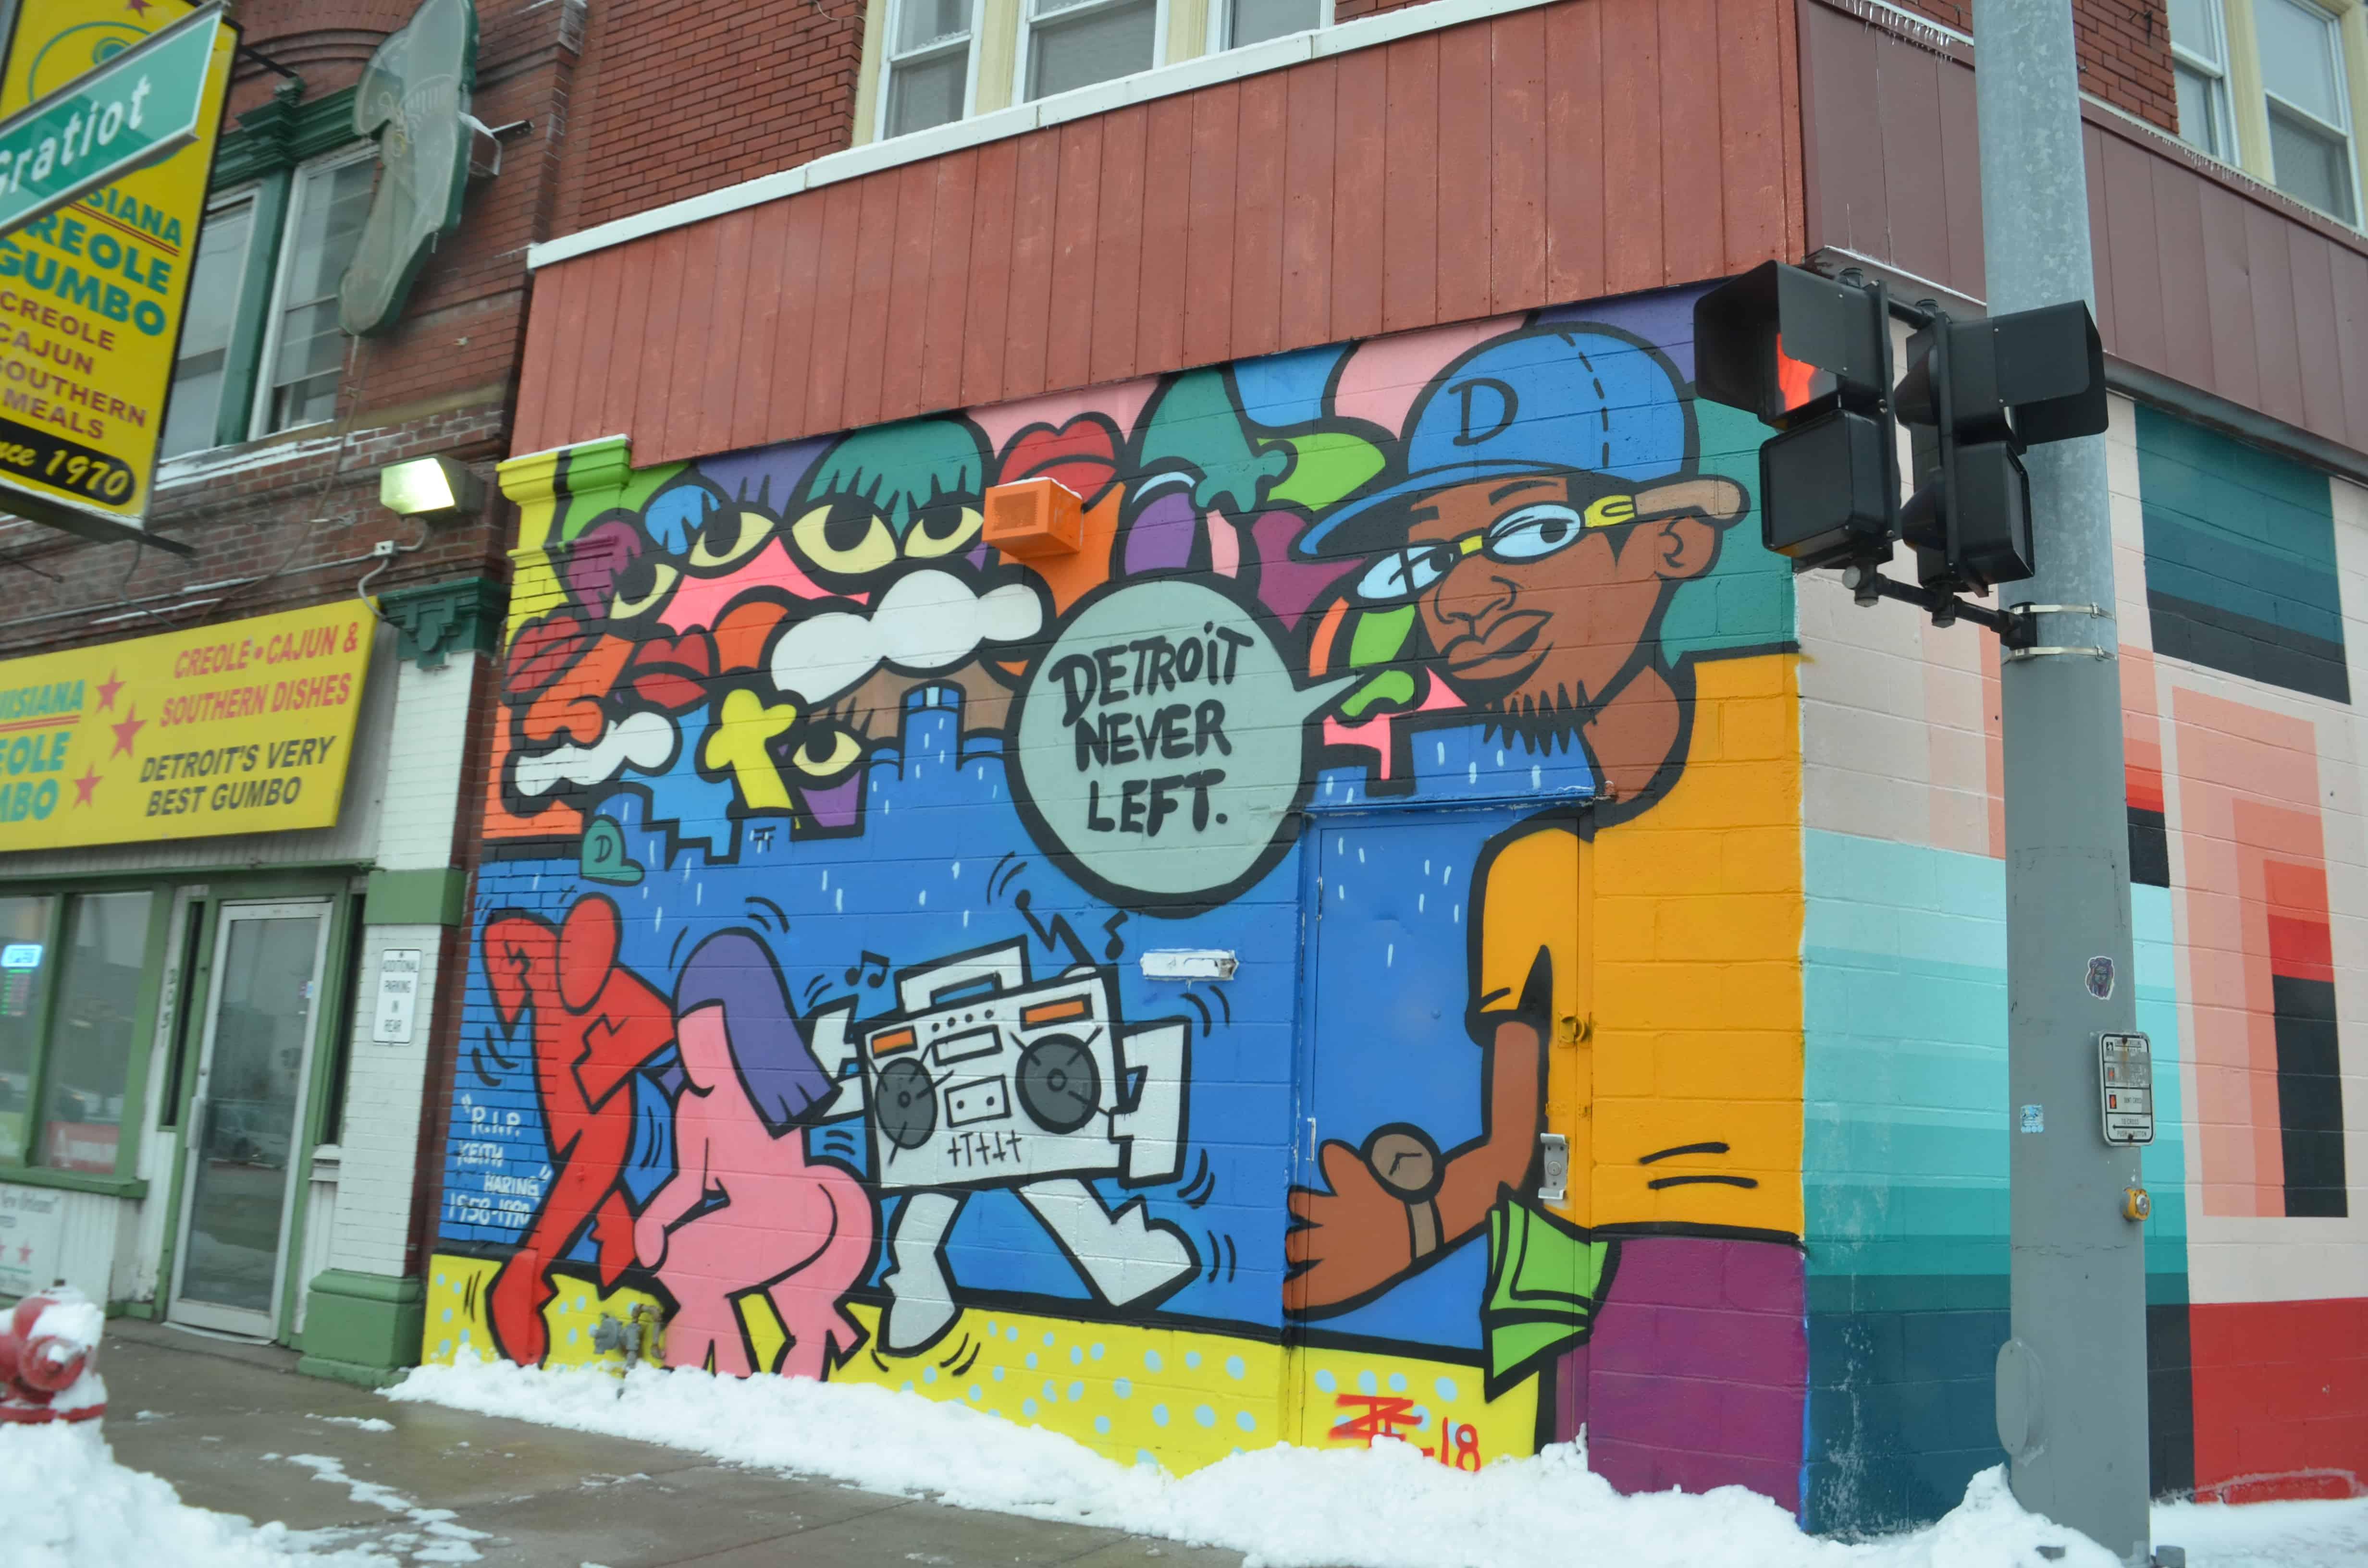 colorful street art mural Detroit